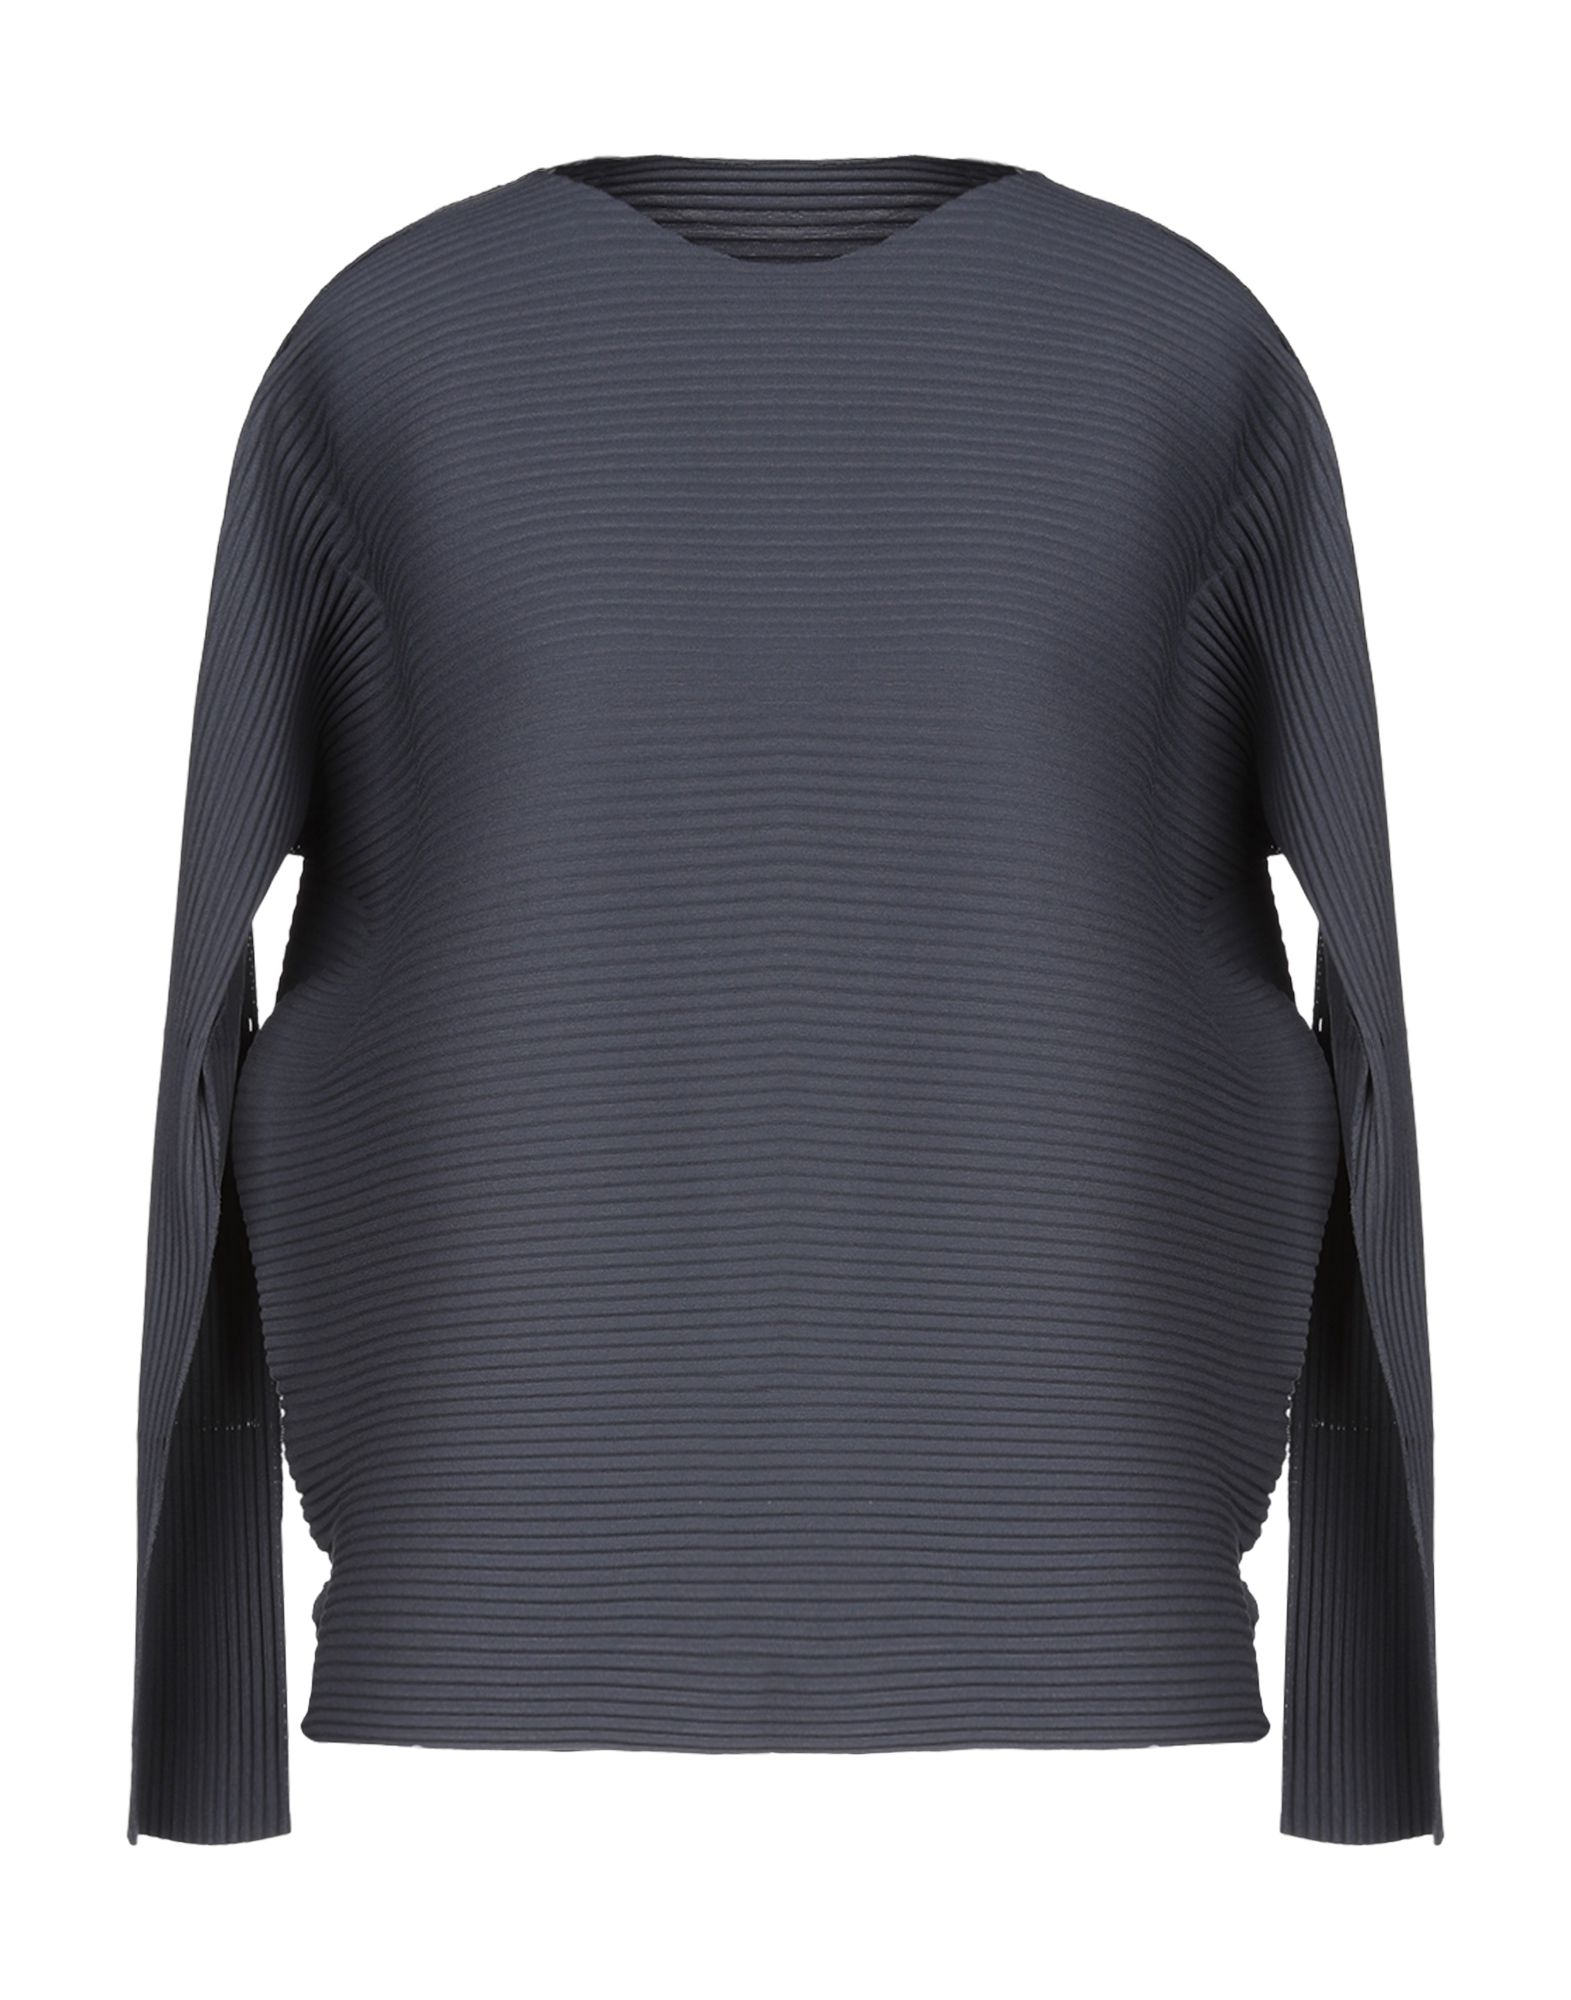 ISSEY MIYAKE CAULIFLOWER T-Shirts in Lead